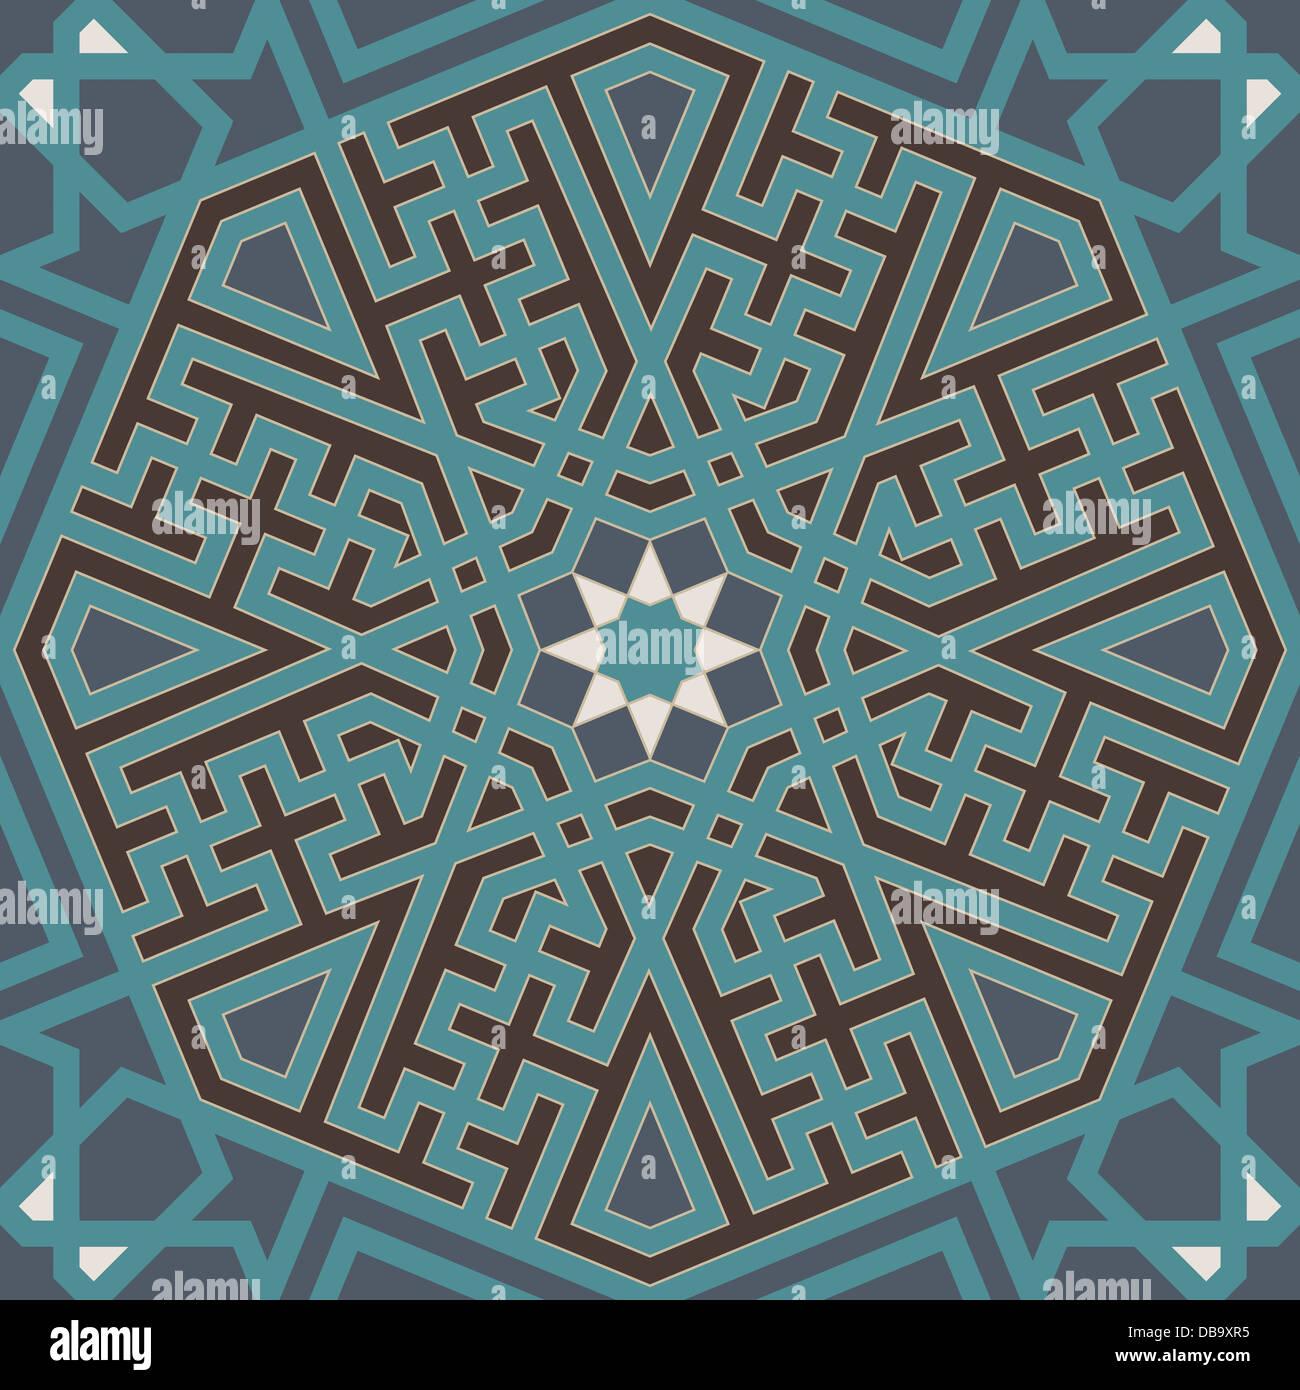 Arabesque seamless pattern - Stock Image